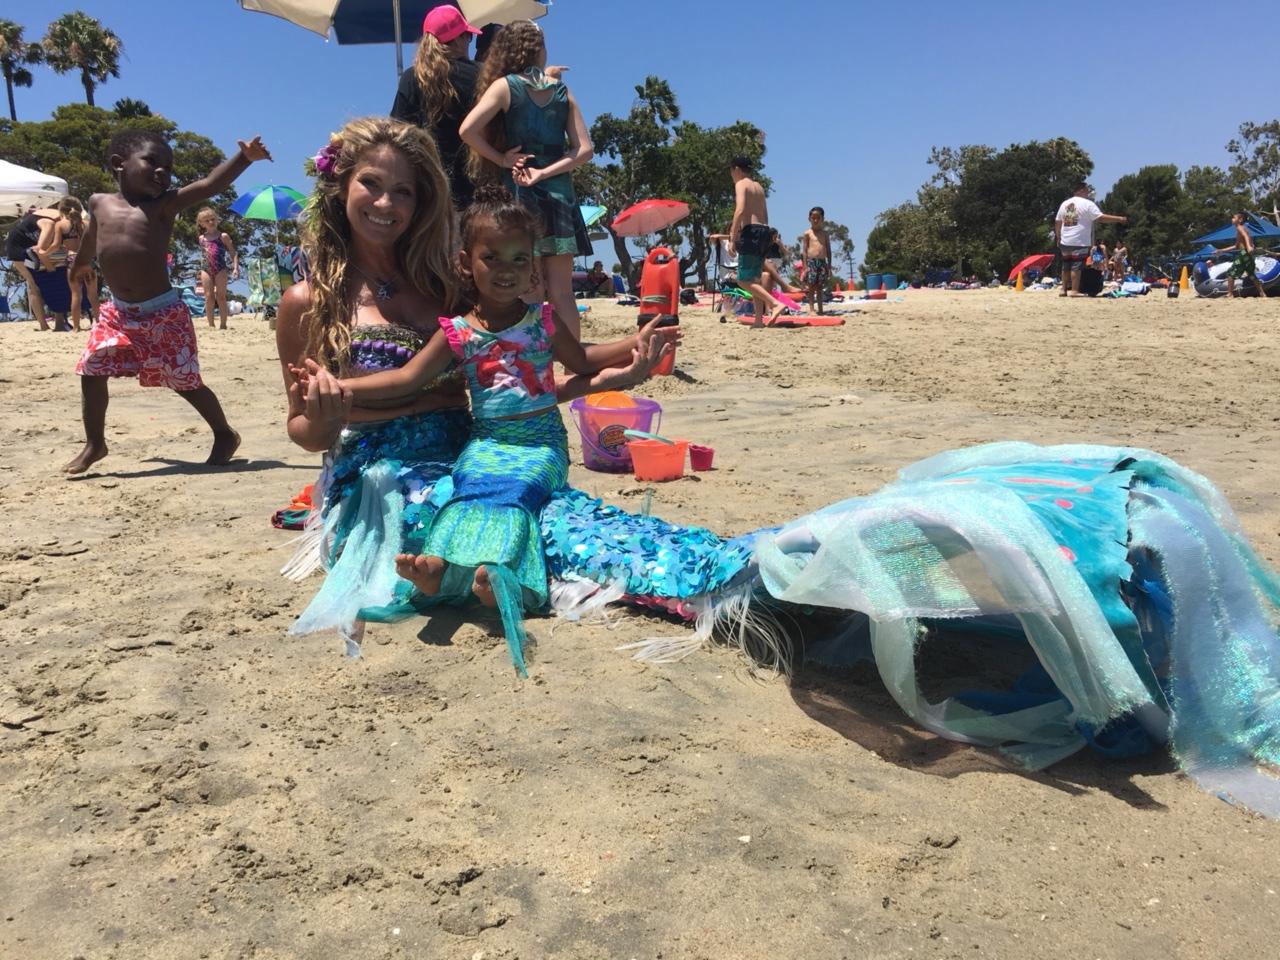 Mermaid Flower and Mini Camper